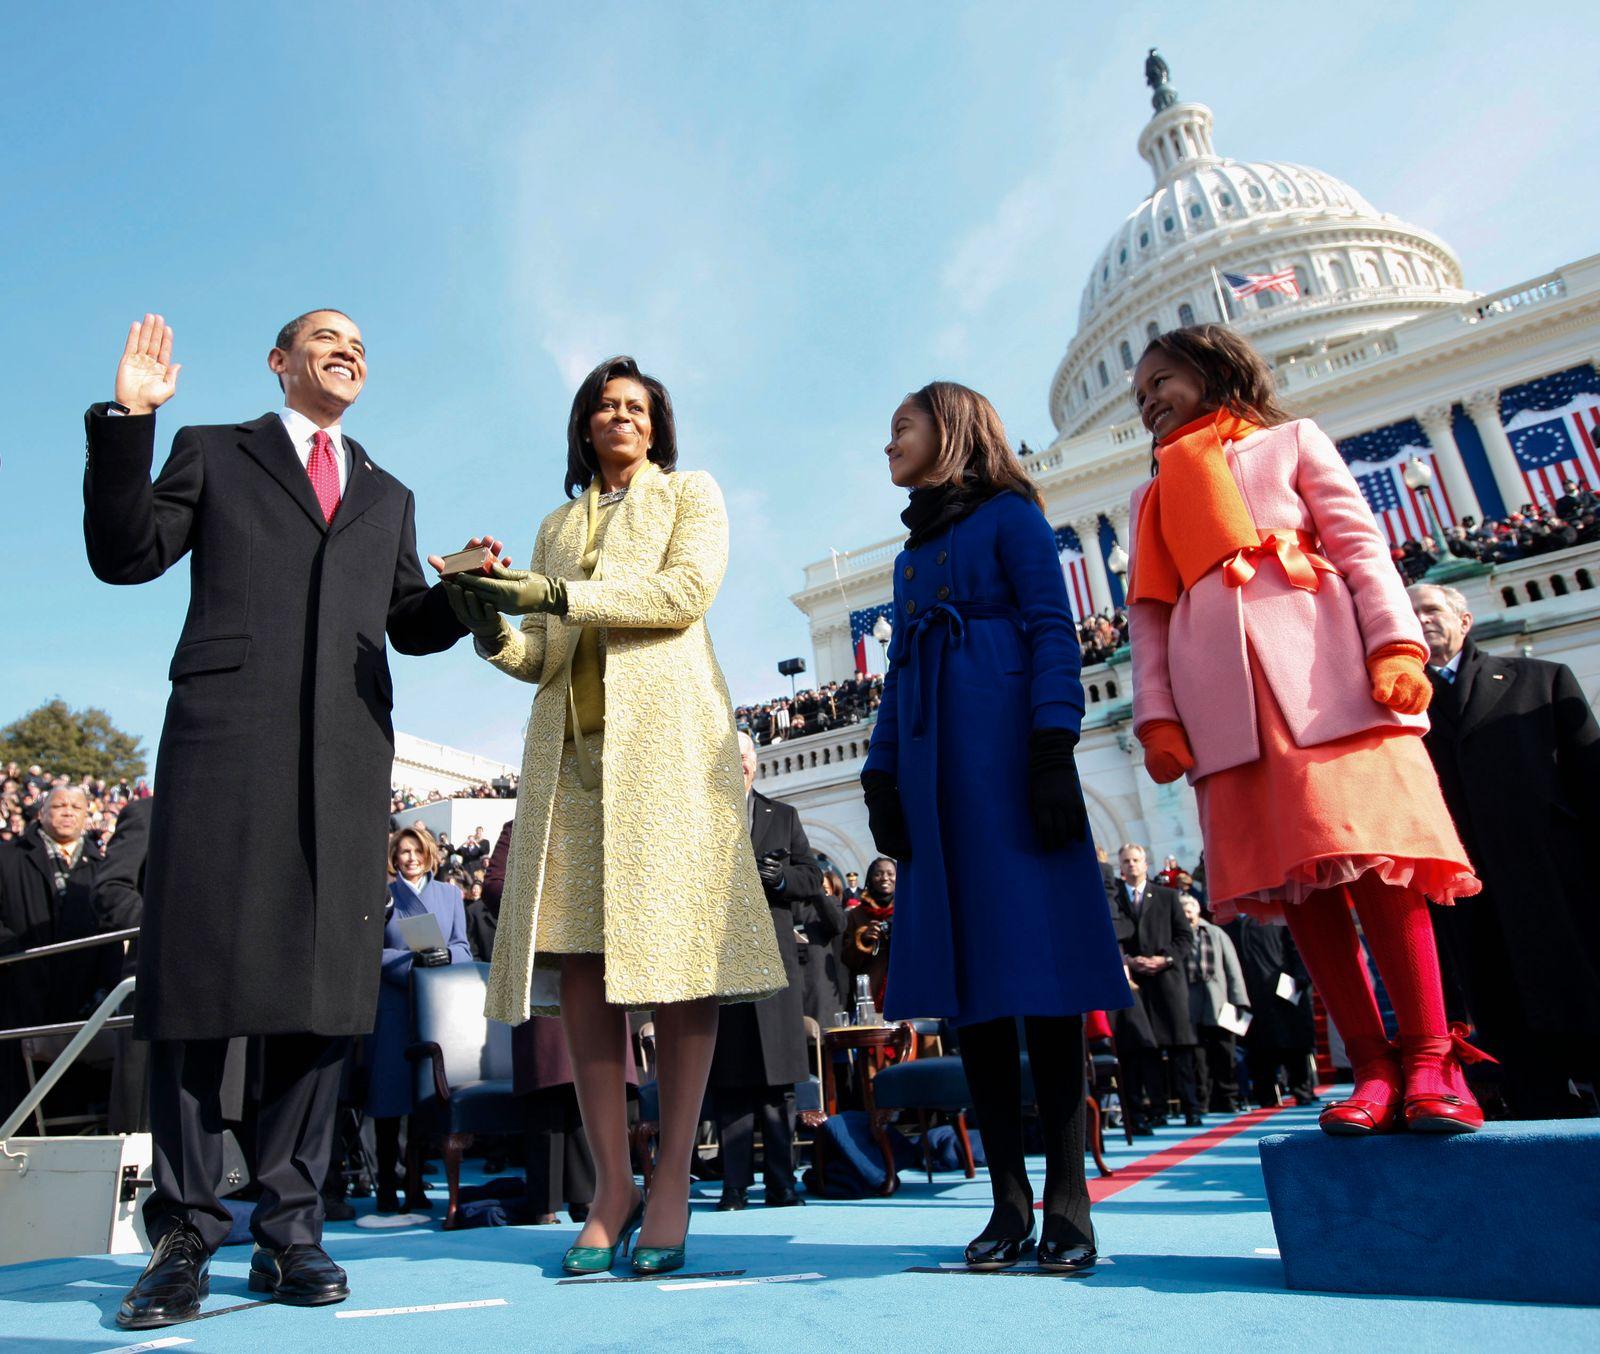 YEARENDER 2009-US-POLITICS-INAUGURATION-OBAMA